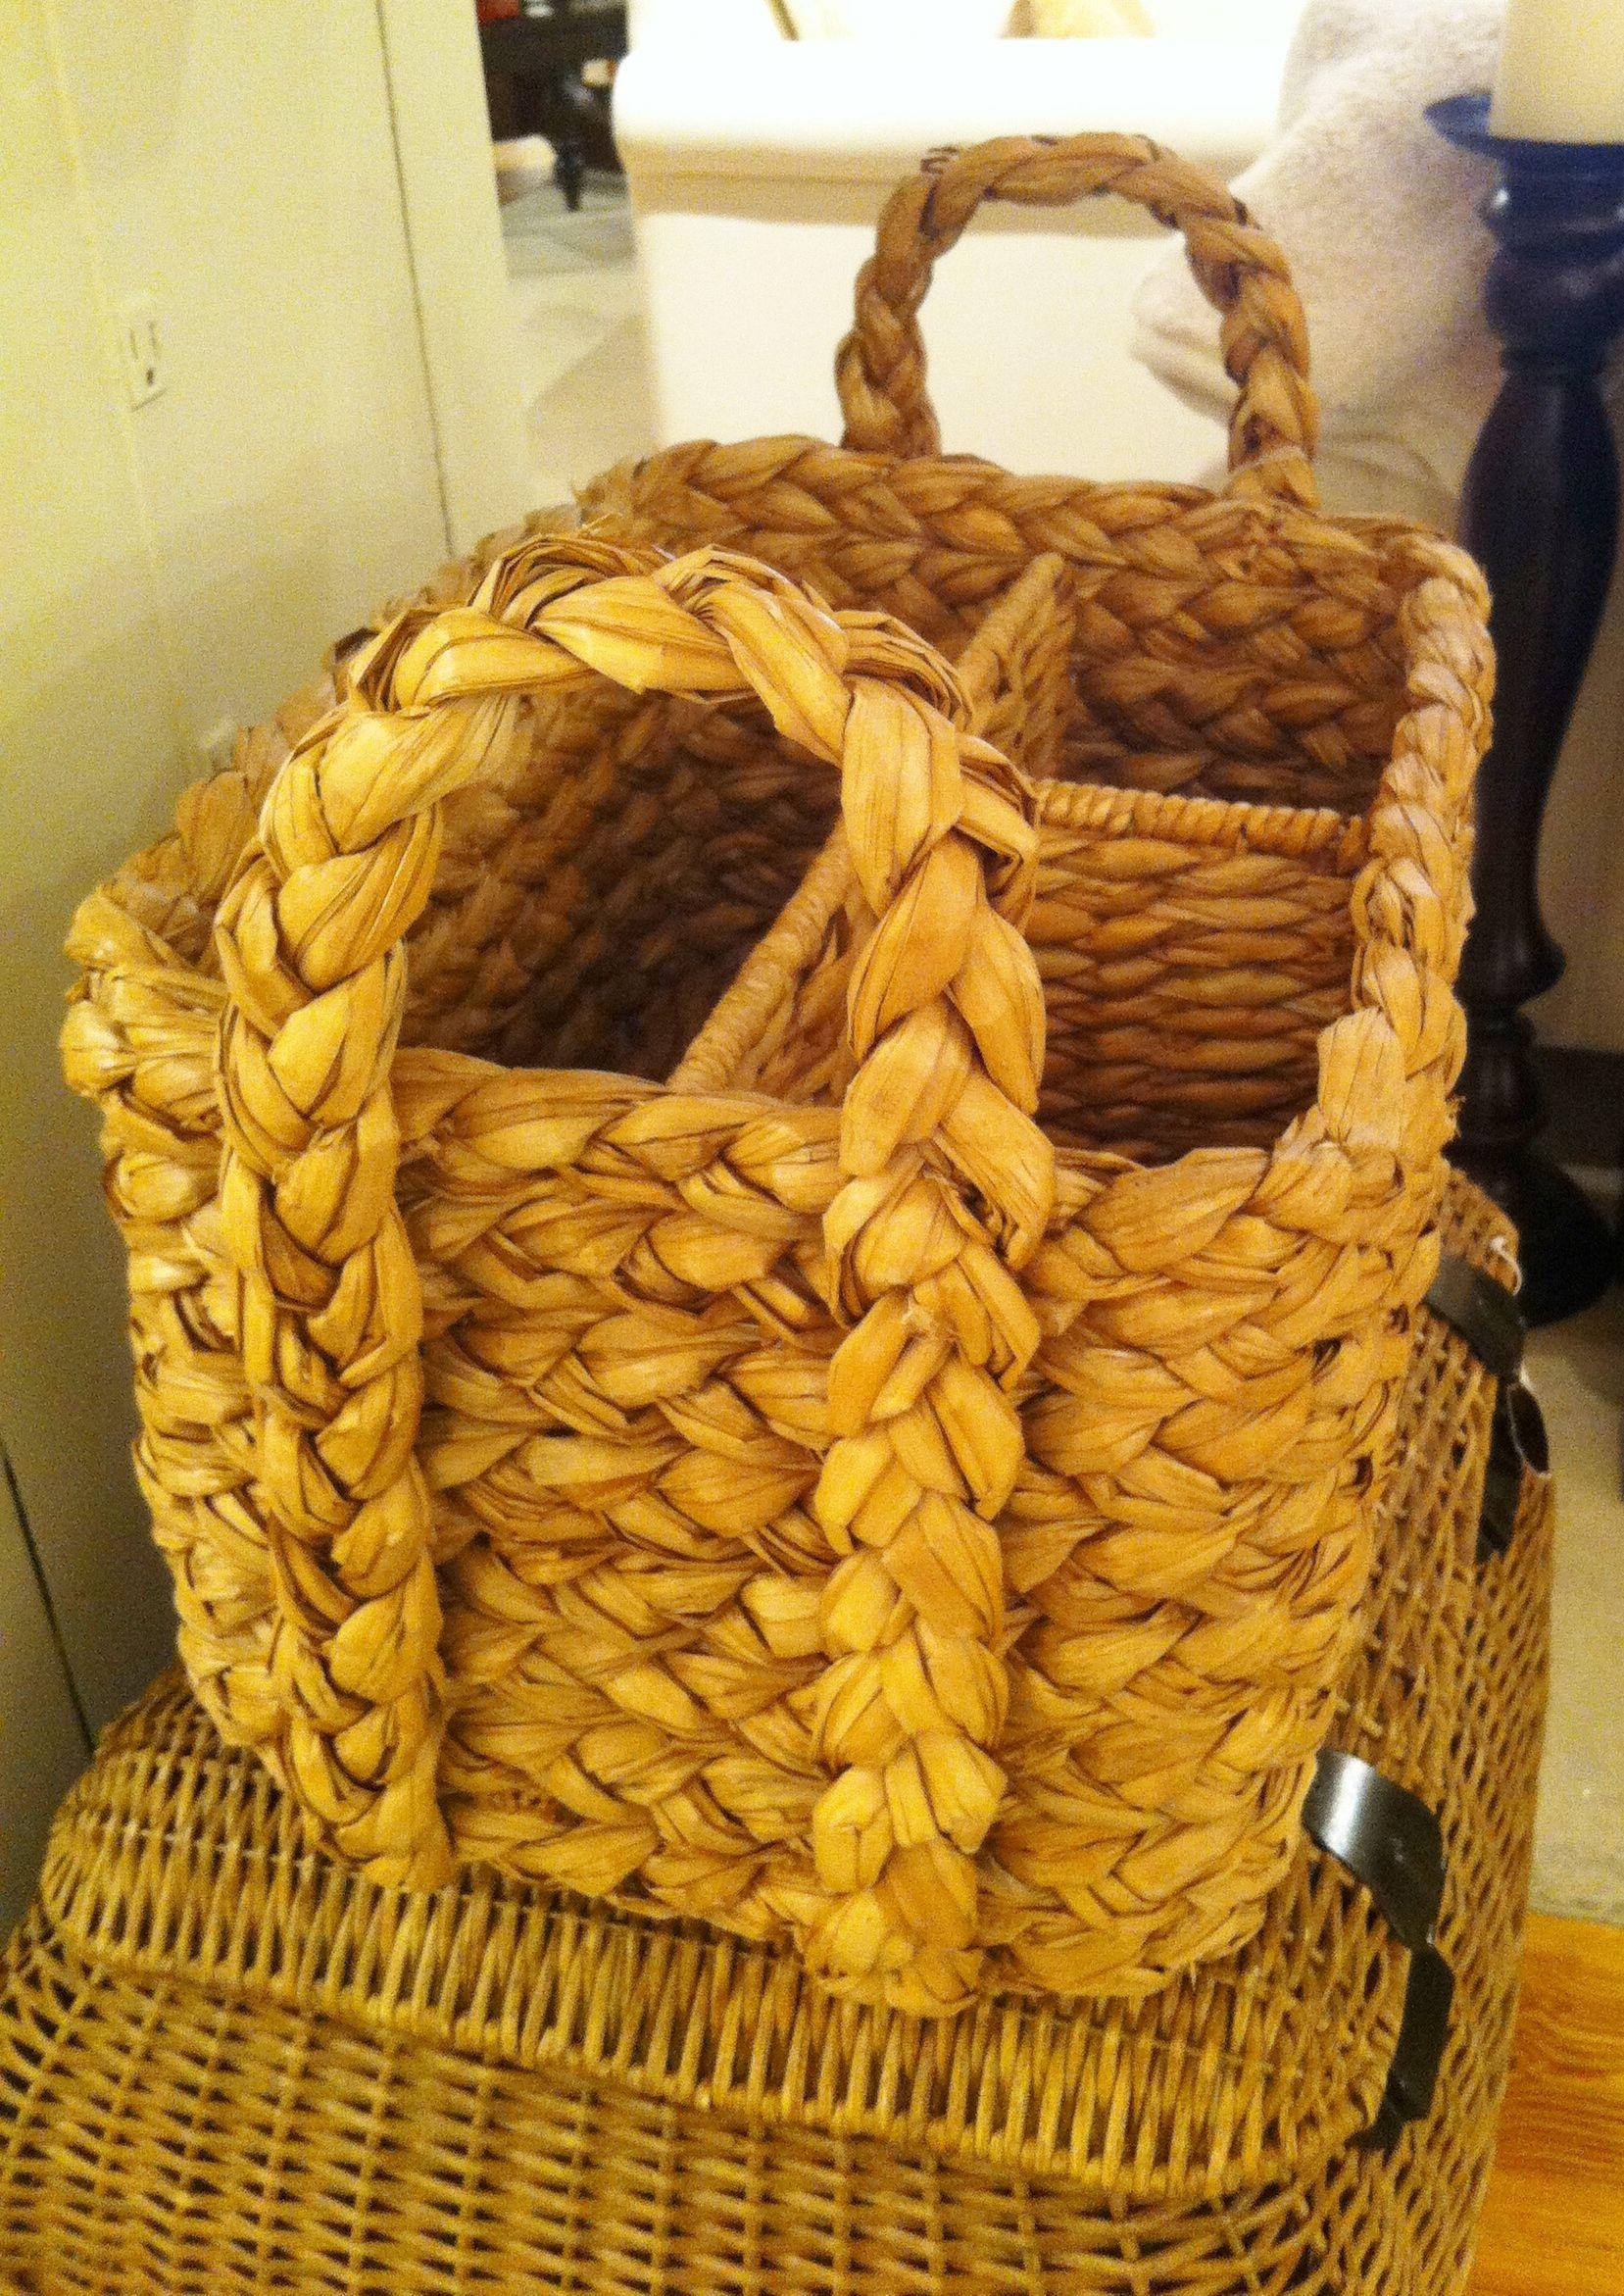 Pottery Barn baskets Pottery barn baskets, Basket